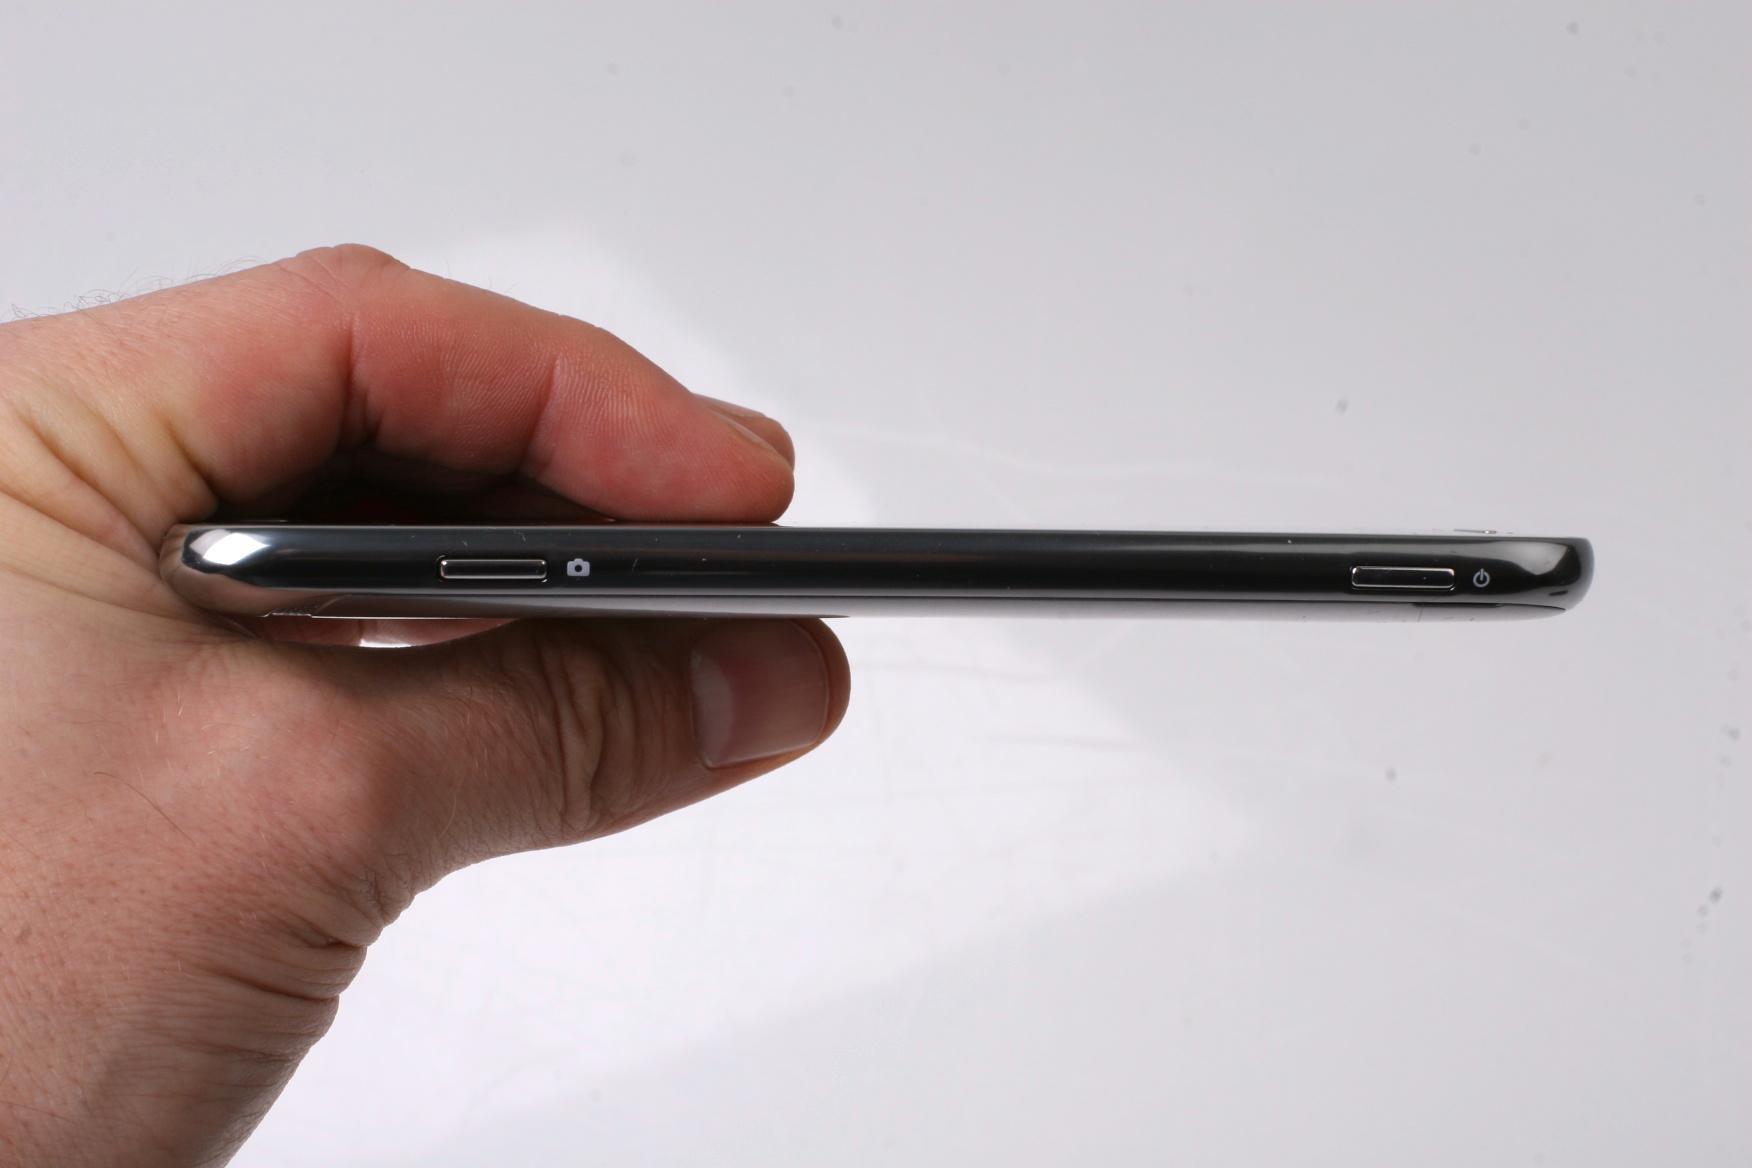 Samsung Ativ S er 8,7 milllimeter tykk.Foto: Kurt Lekanger, Amobil.no